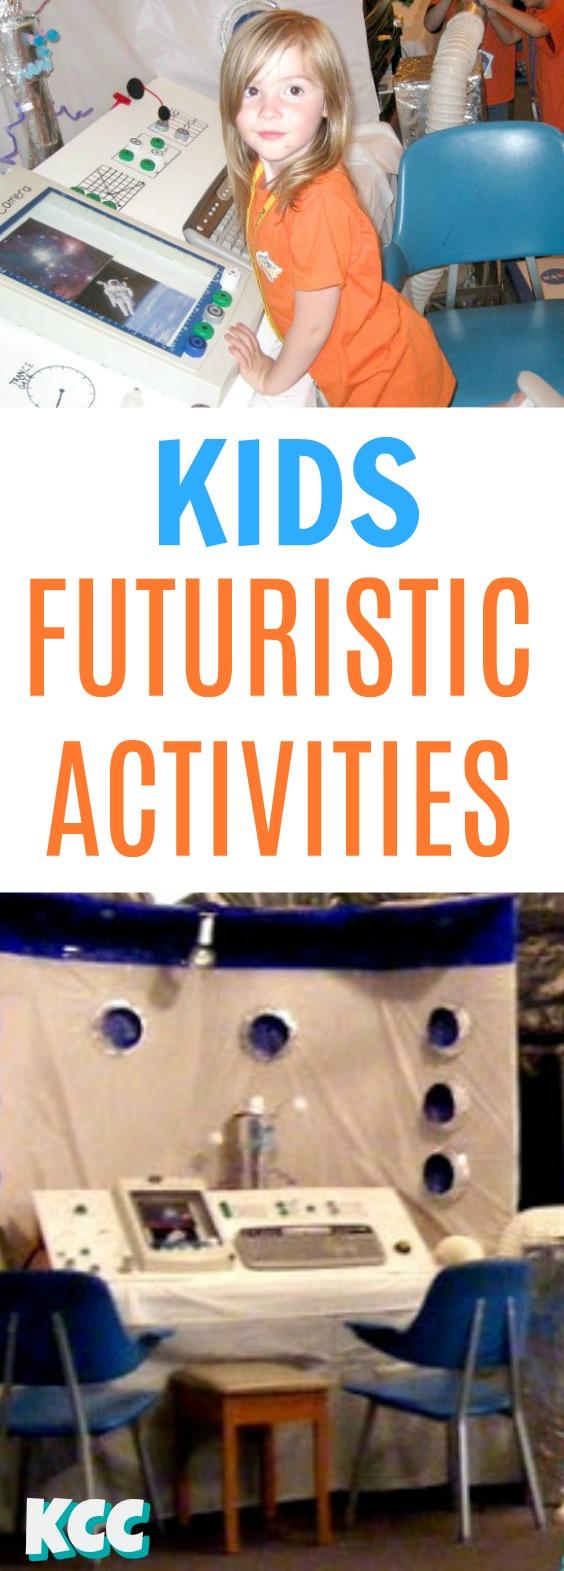 Futuristic Activities for Kids